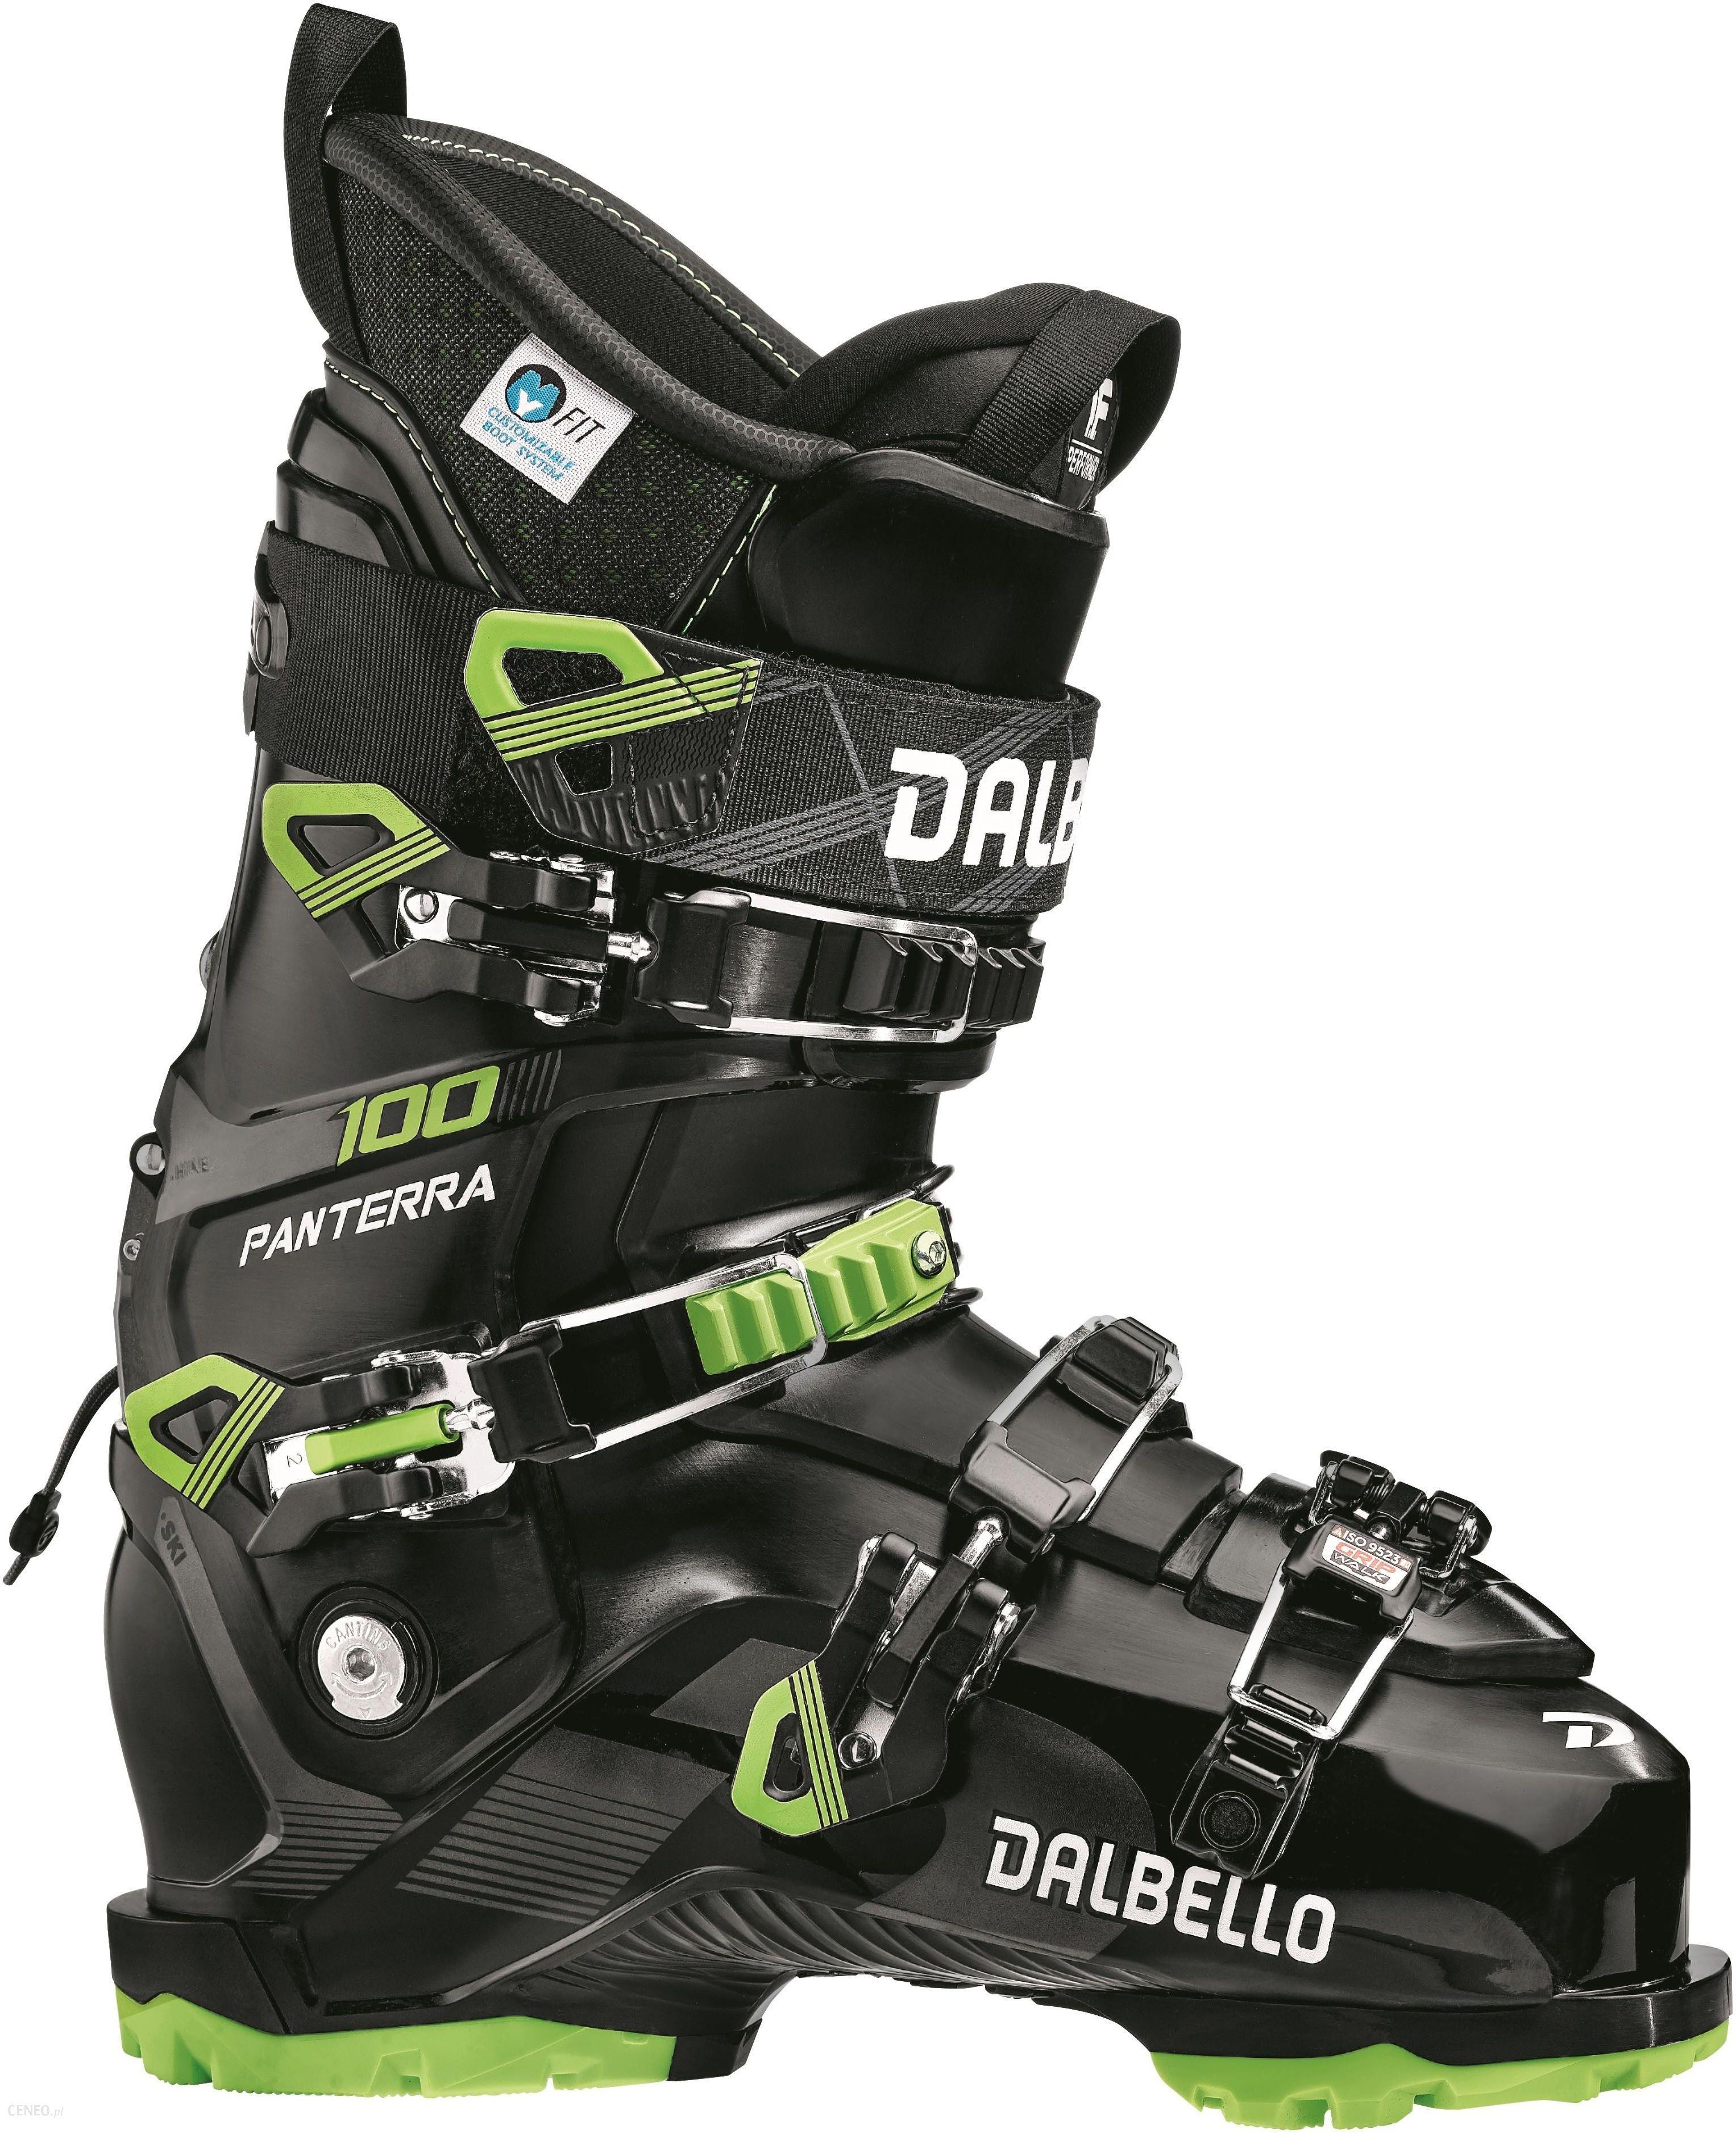 Dalbello Panterra 100 Black Lime 2020 / 2021